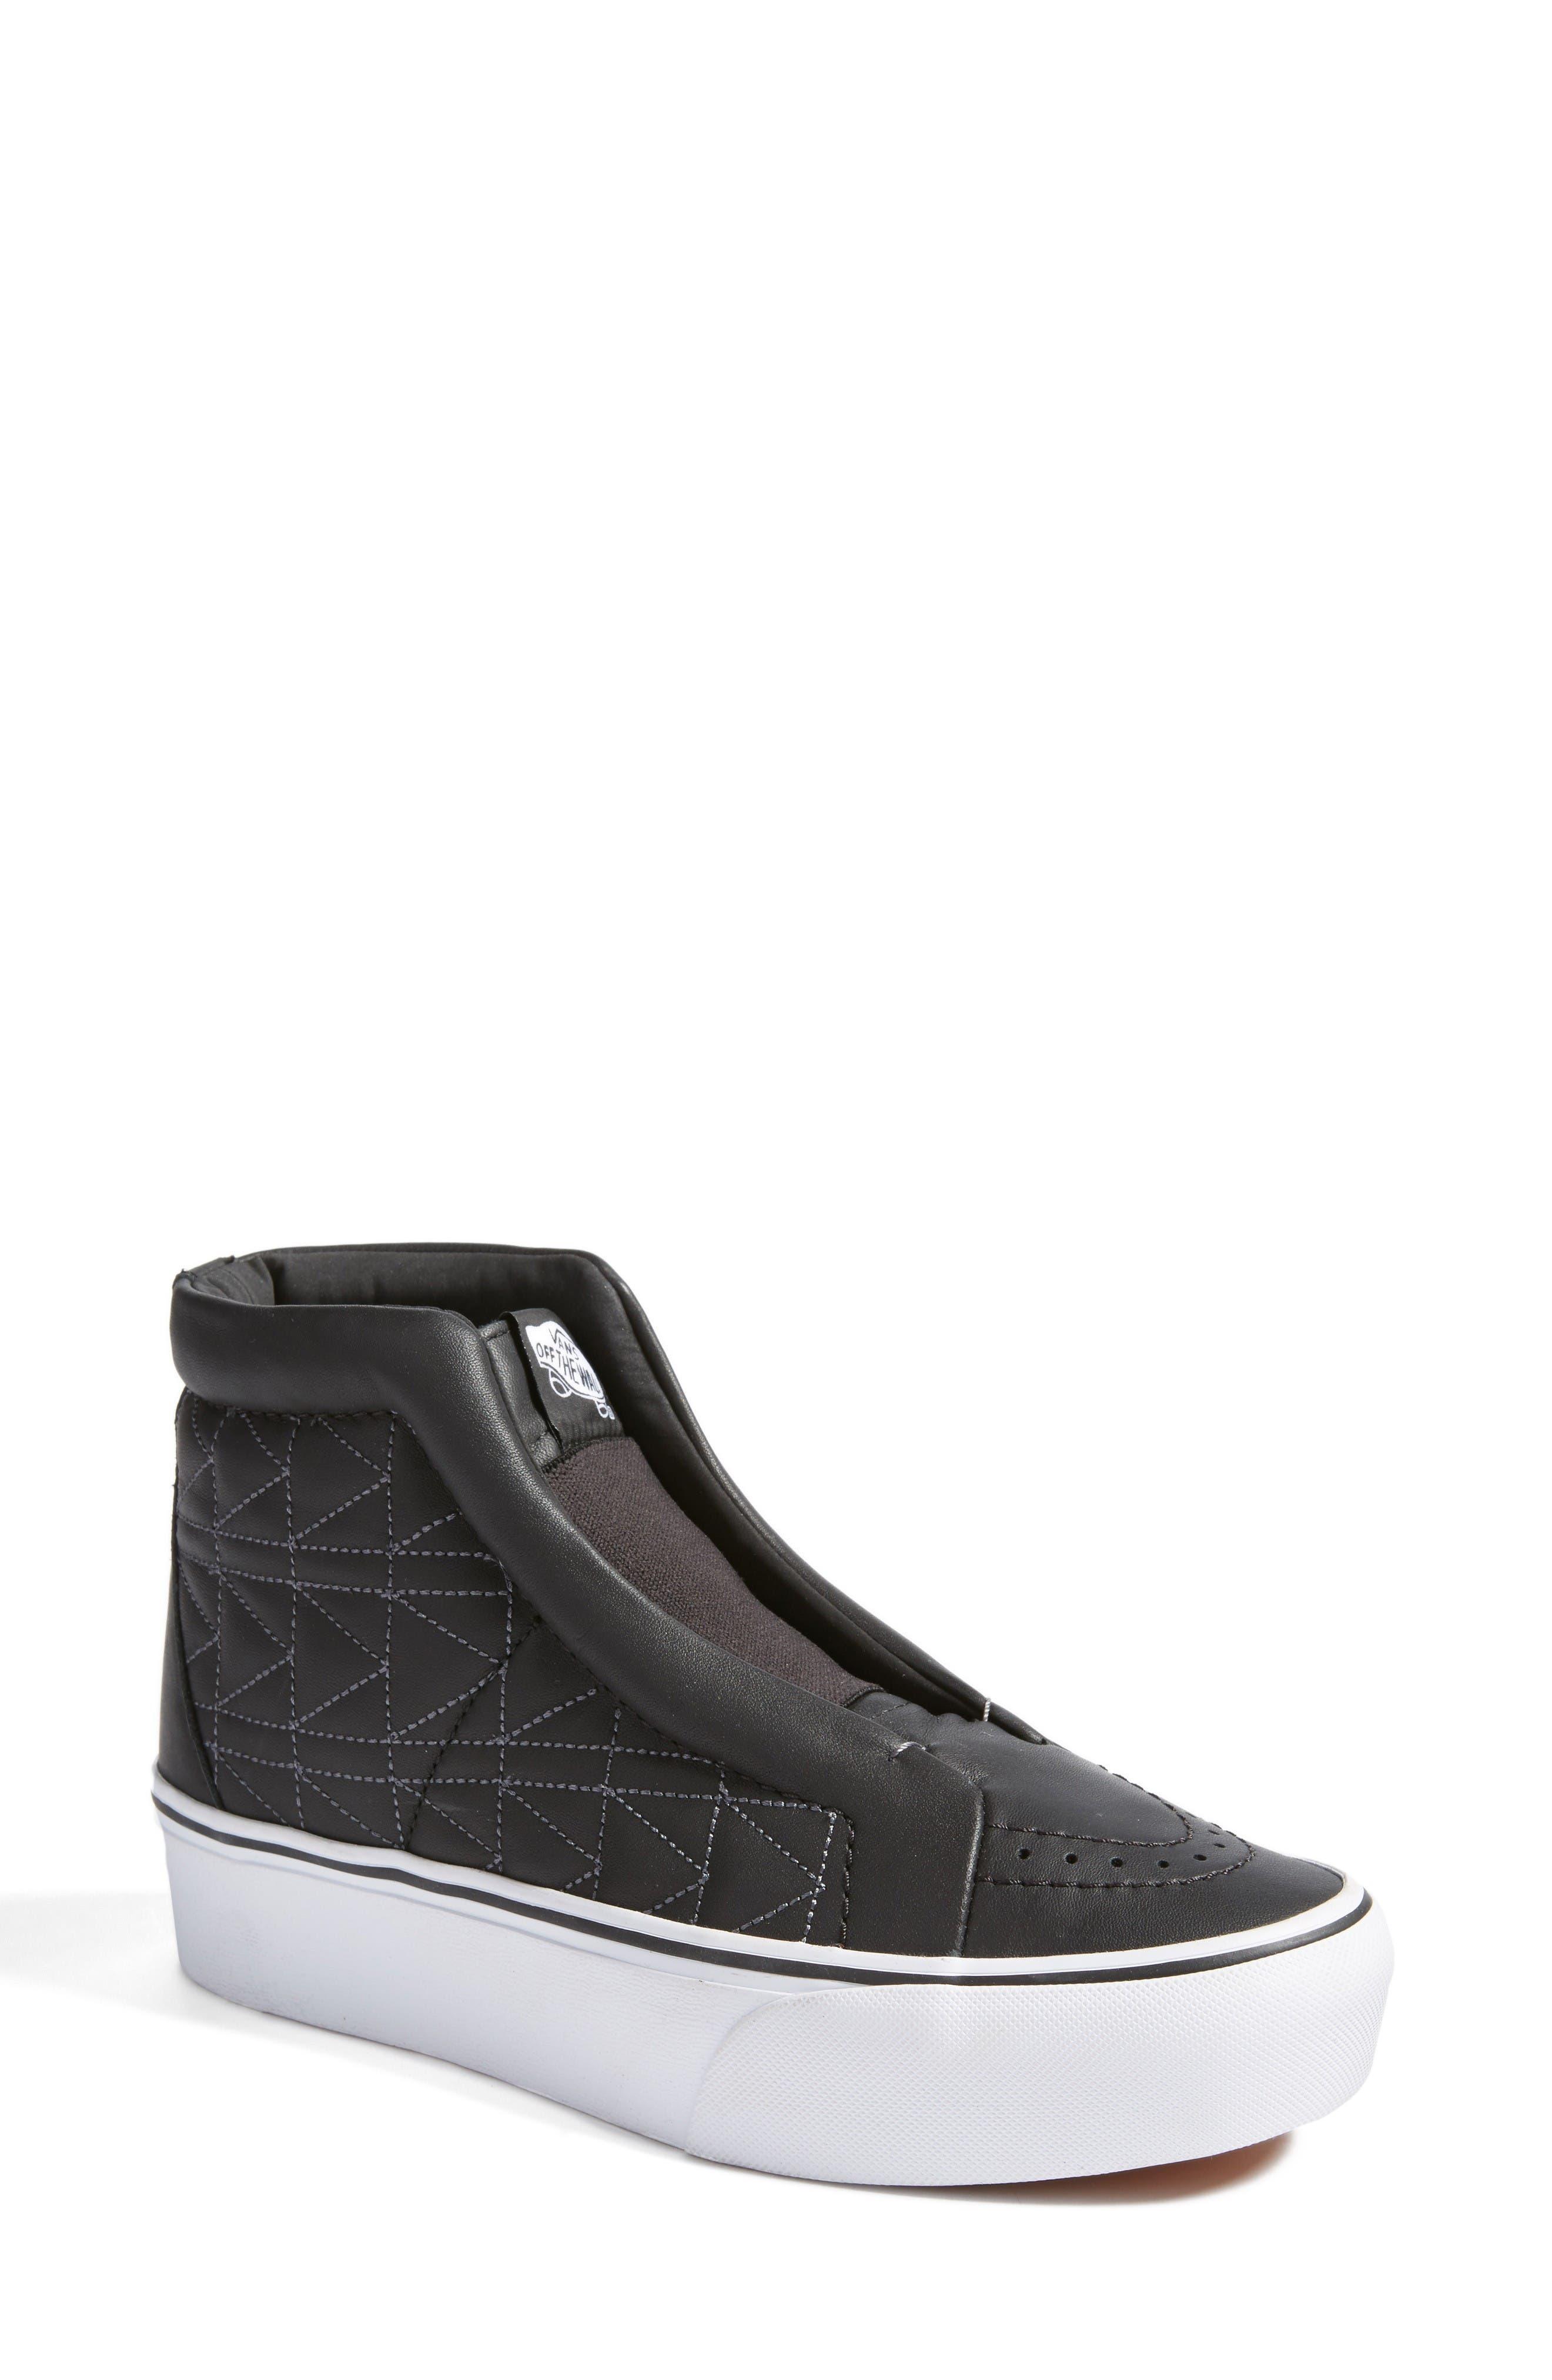 Vans x KARL LAGERFELD SK8-Hi Leather Sneaker (Women)